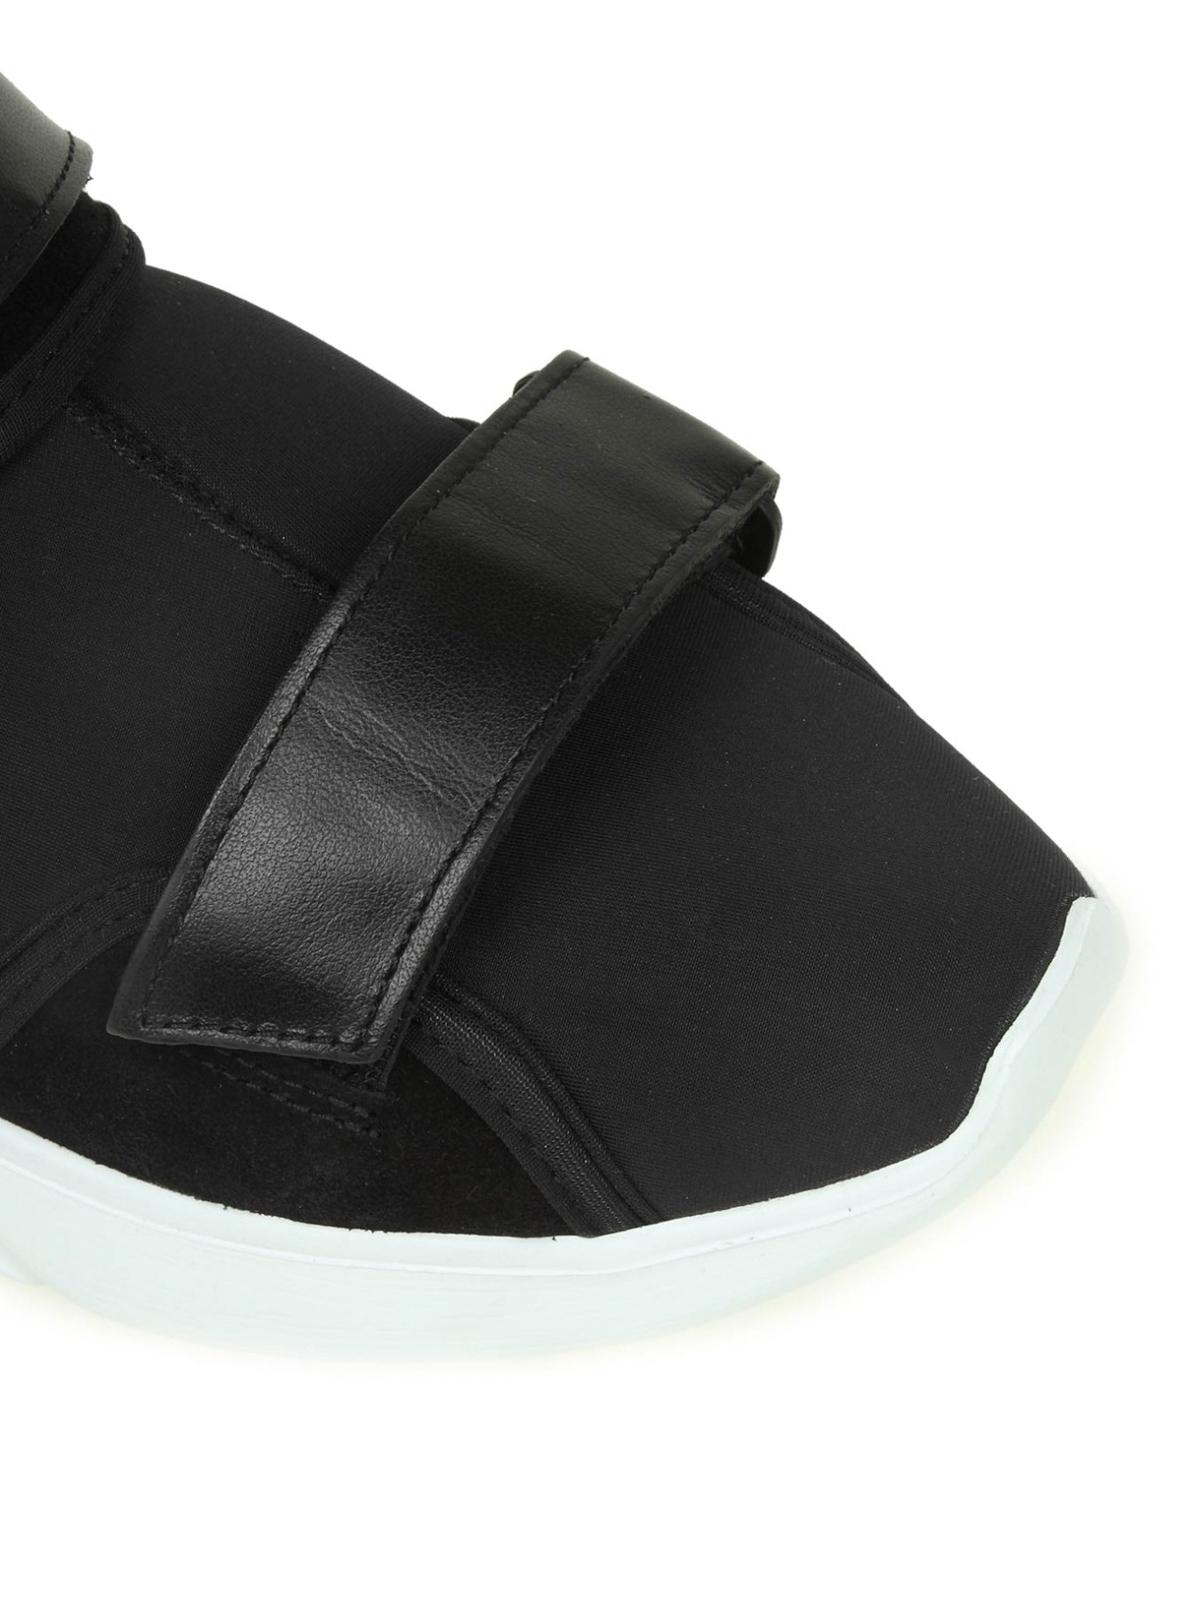 Moschino - Neoprene sock sneakers with